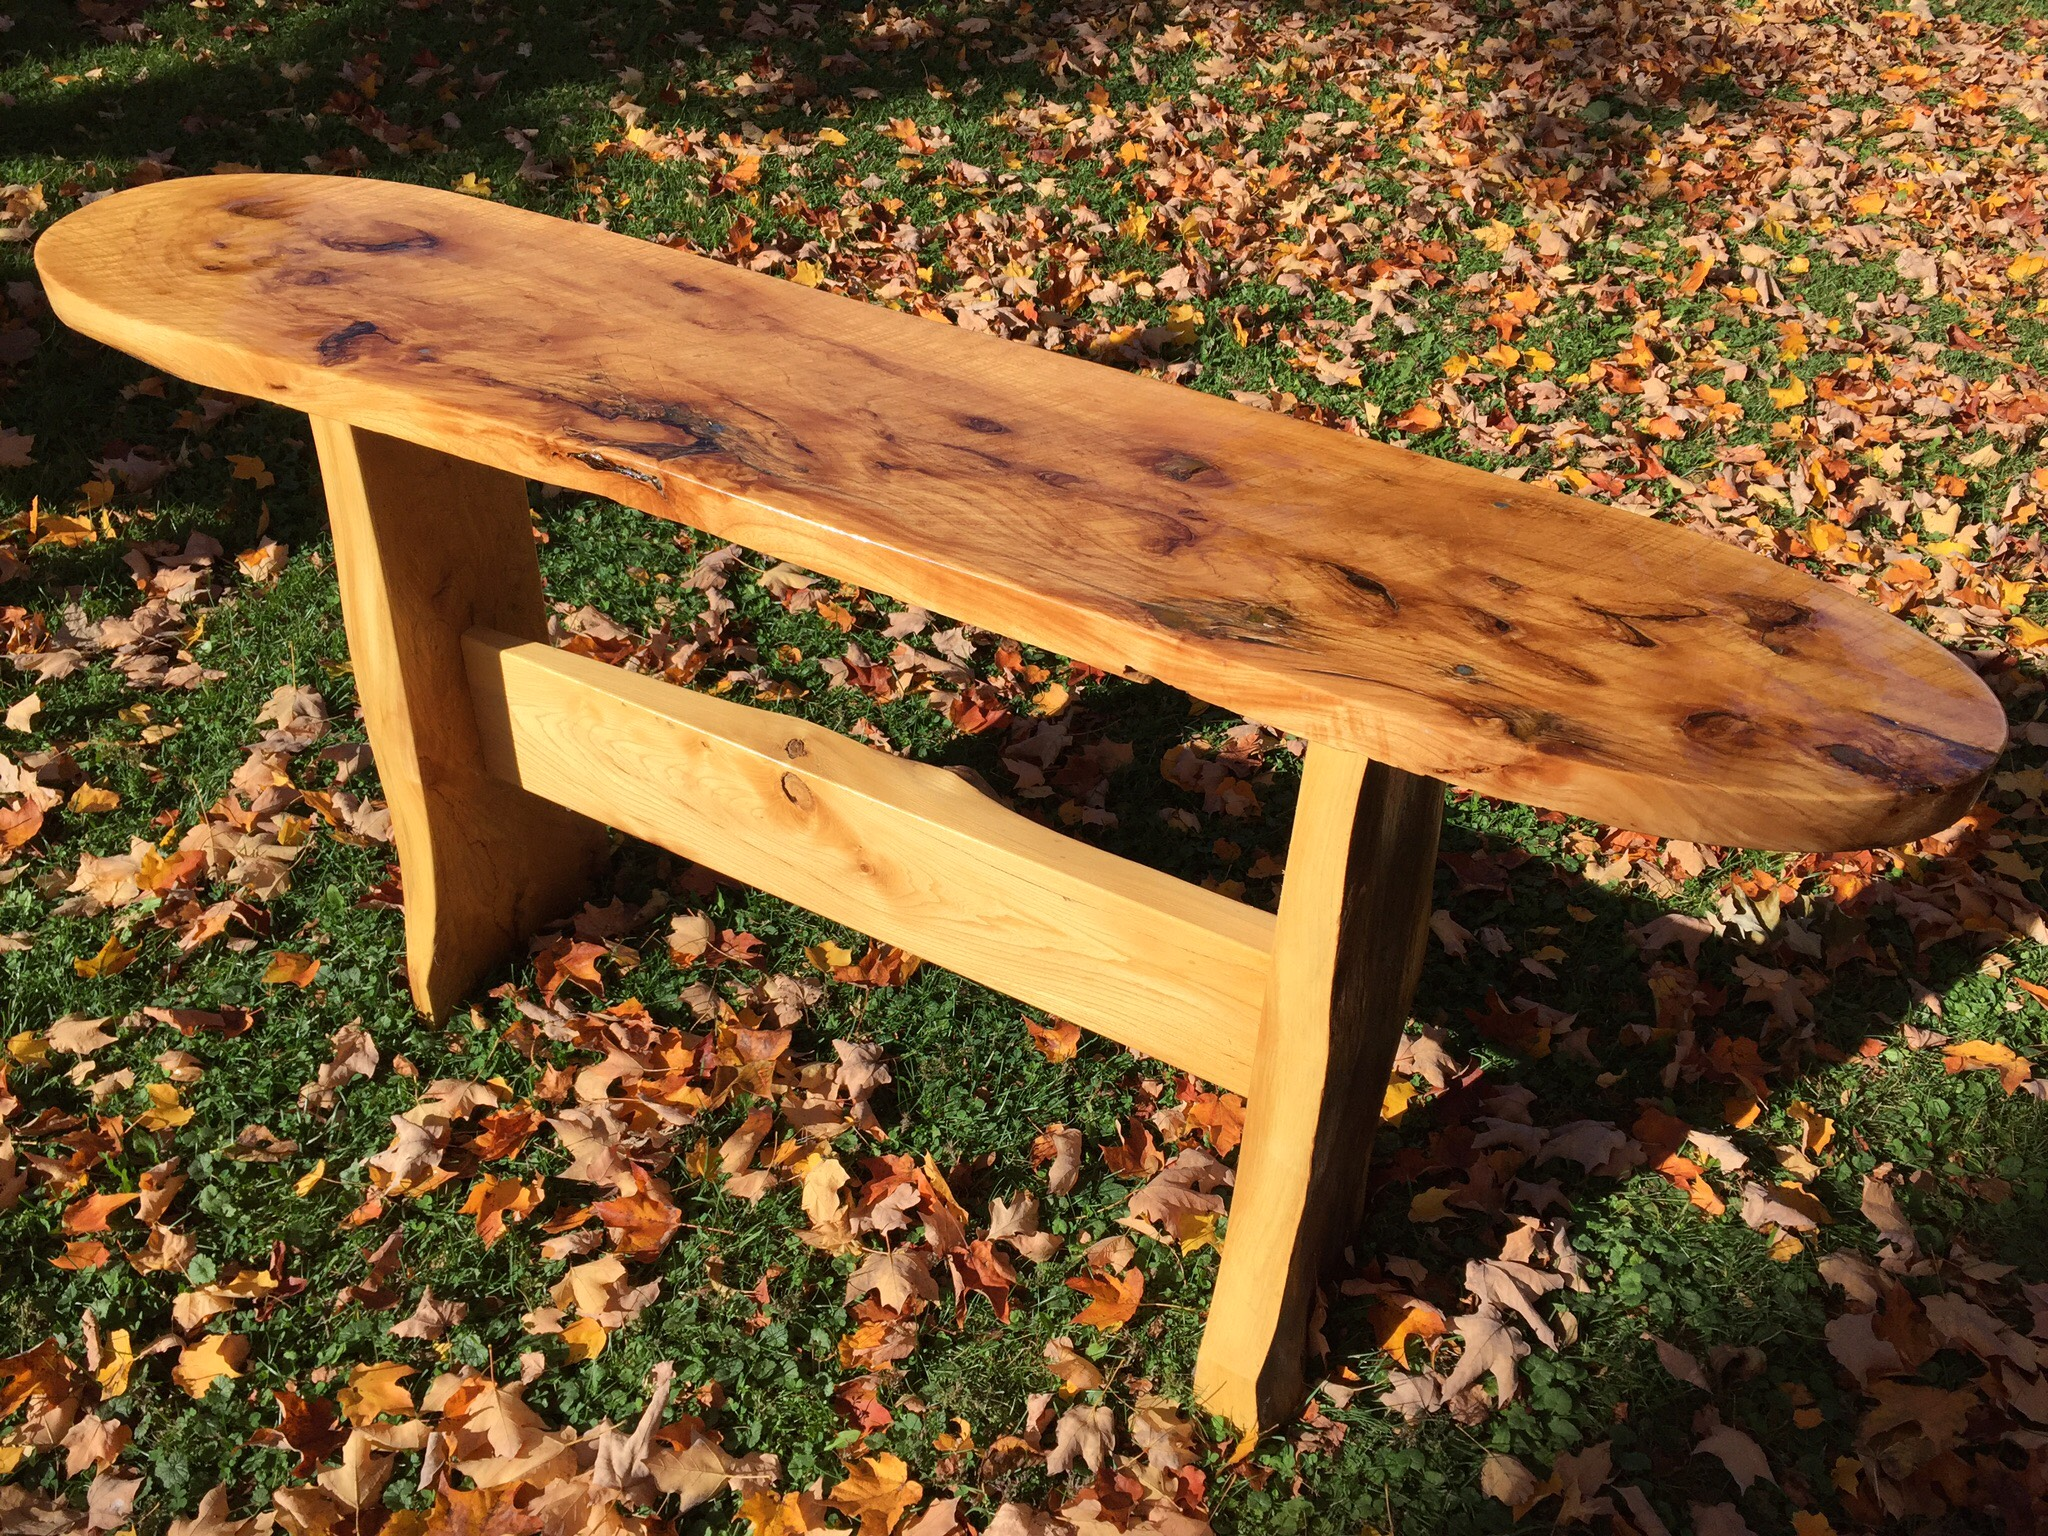 Wood, Elm Burl, Trestle Slab Table, Ziembo Home, Brooklyn Center, MN